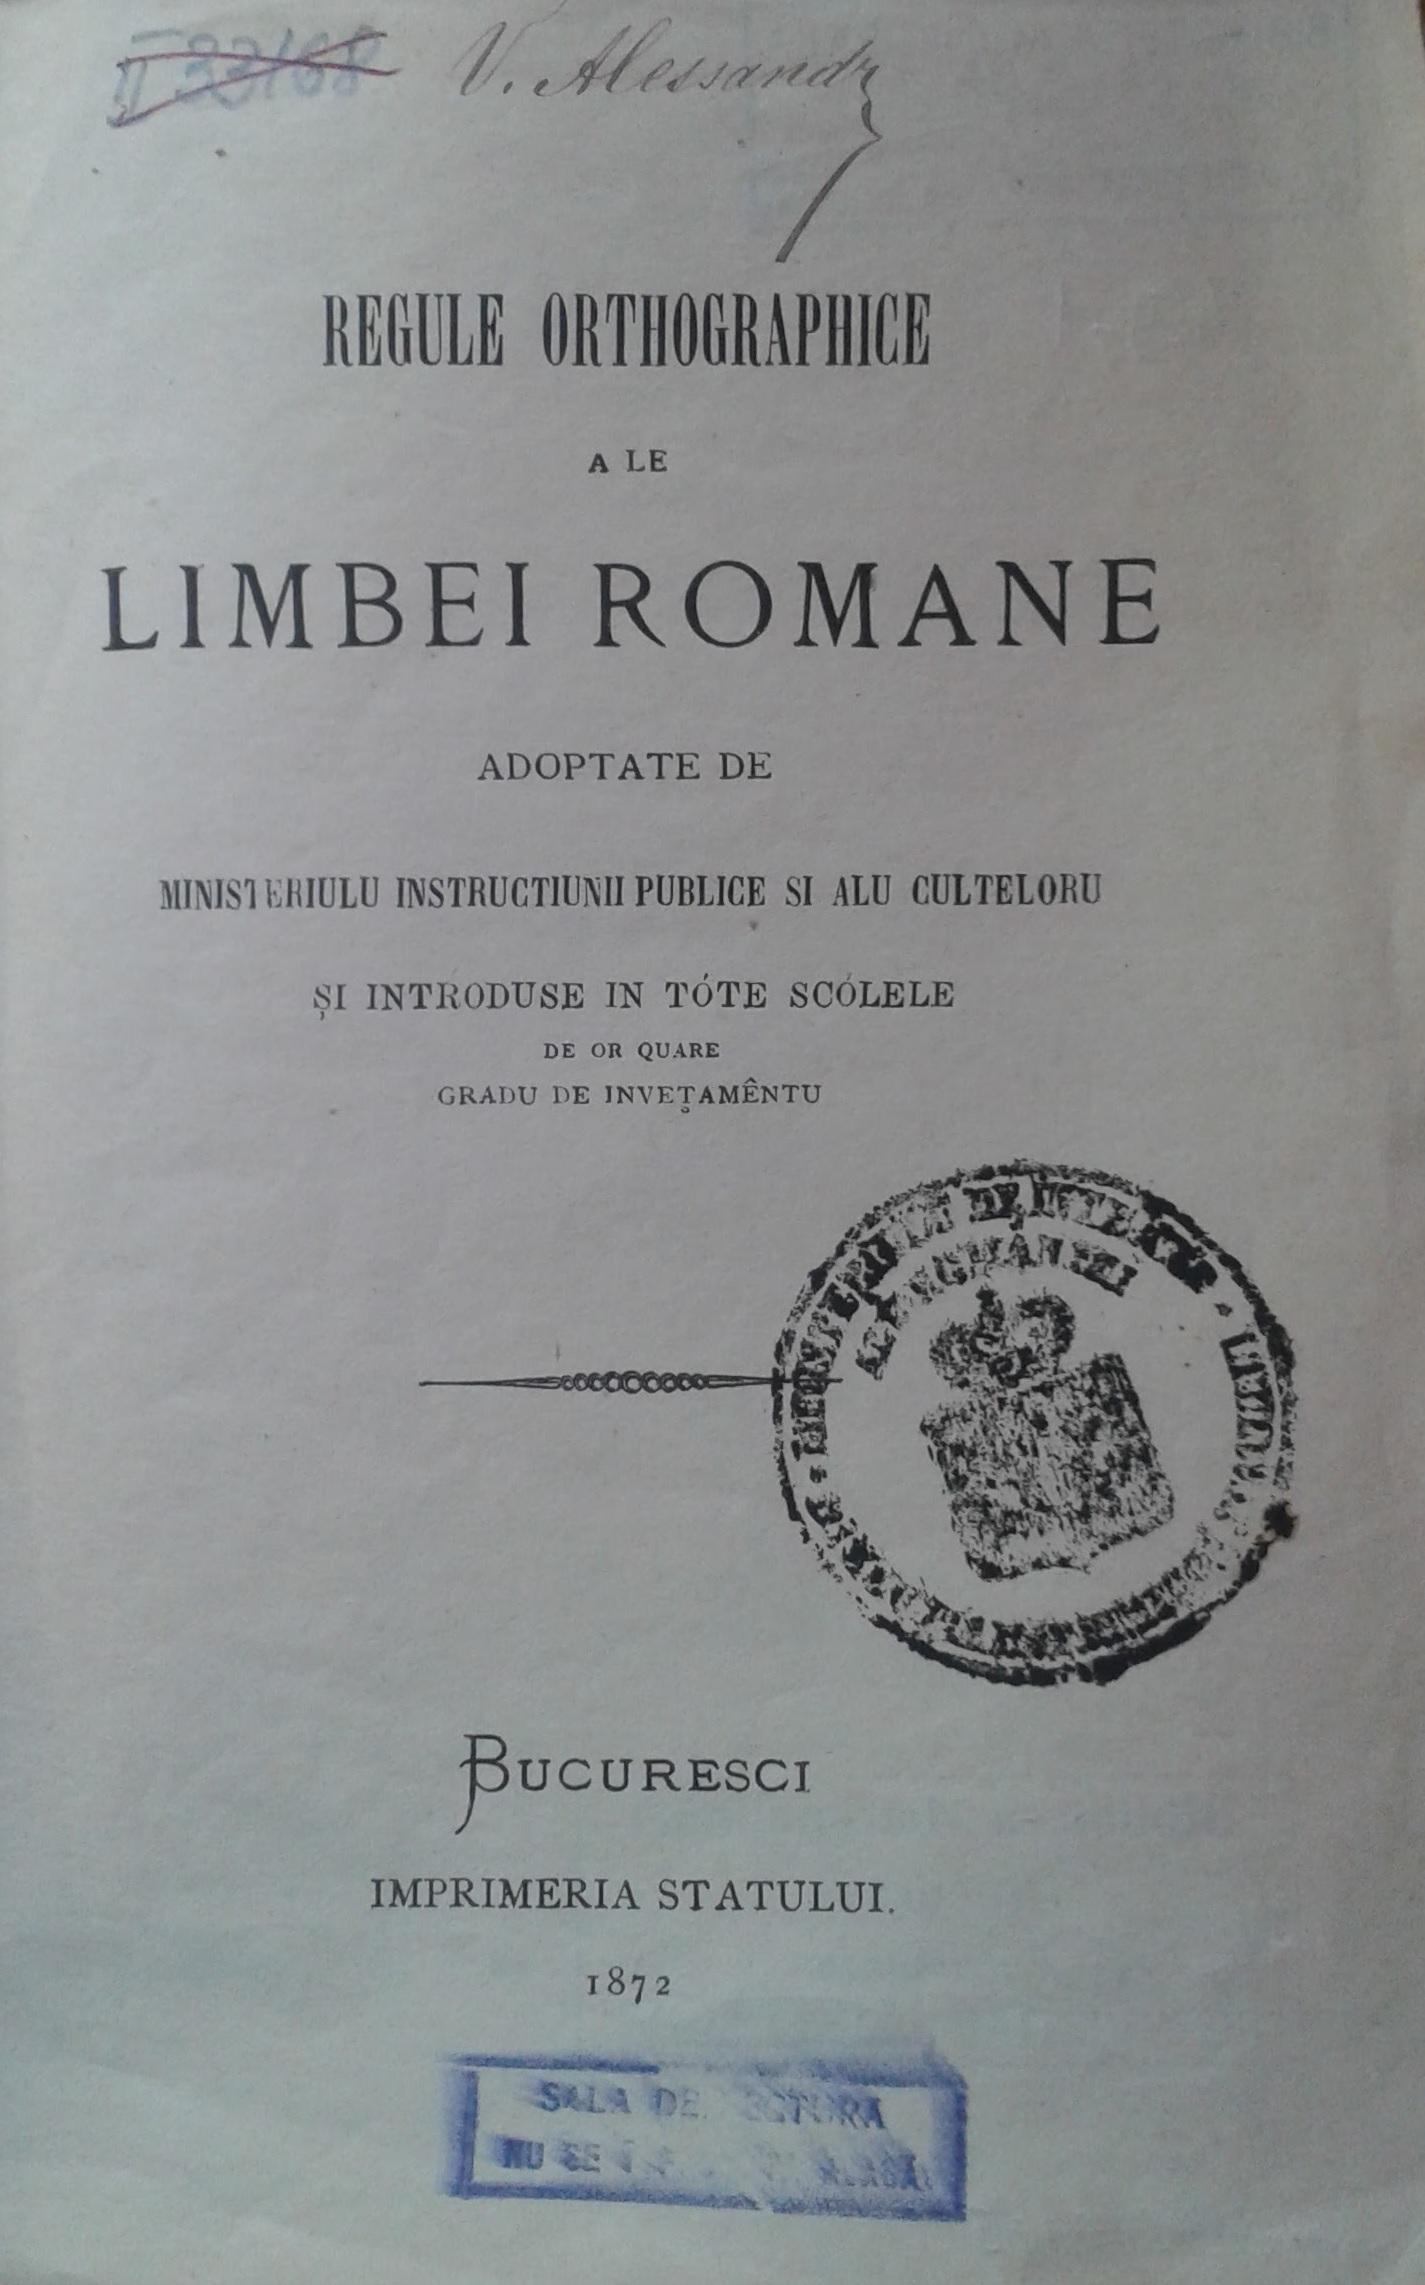 Regule ortografice 1871 (1).jpg